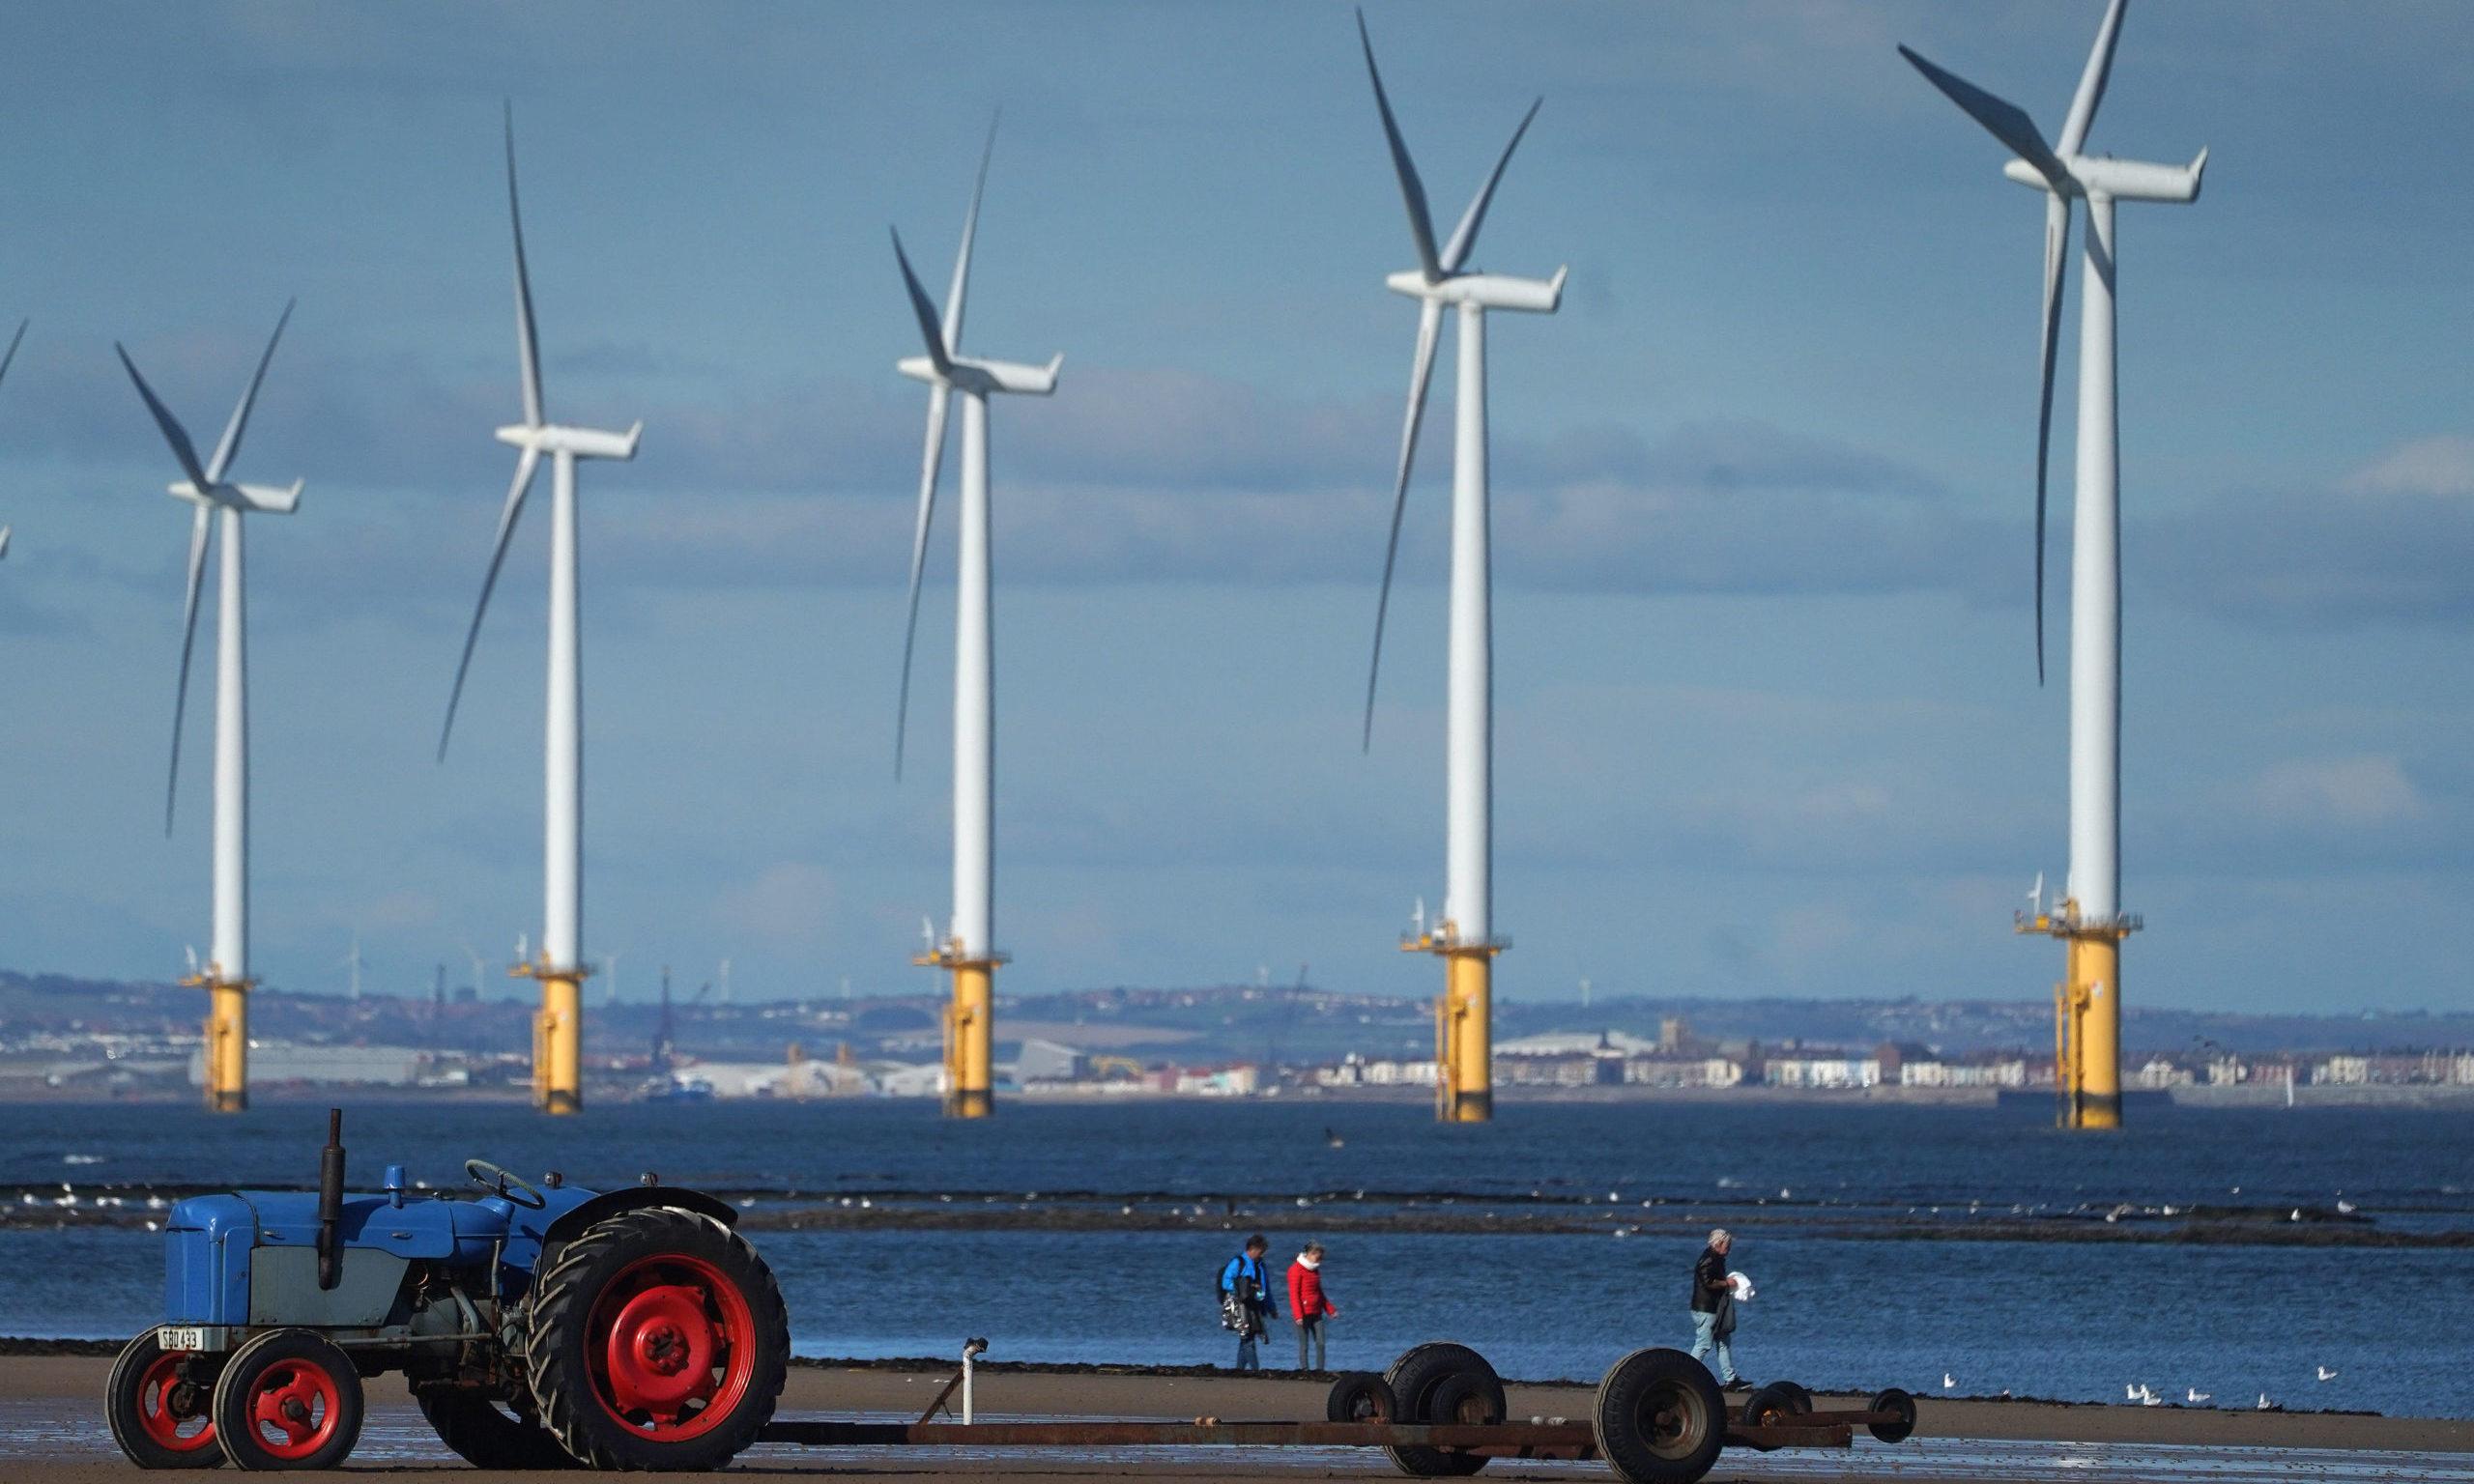 cromarty greenports wind